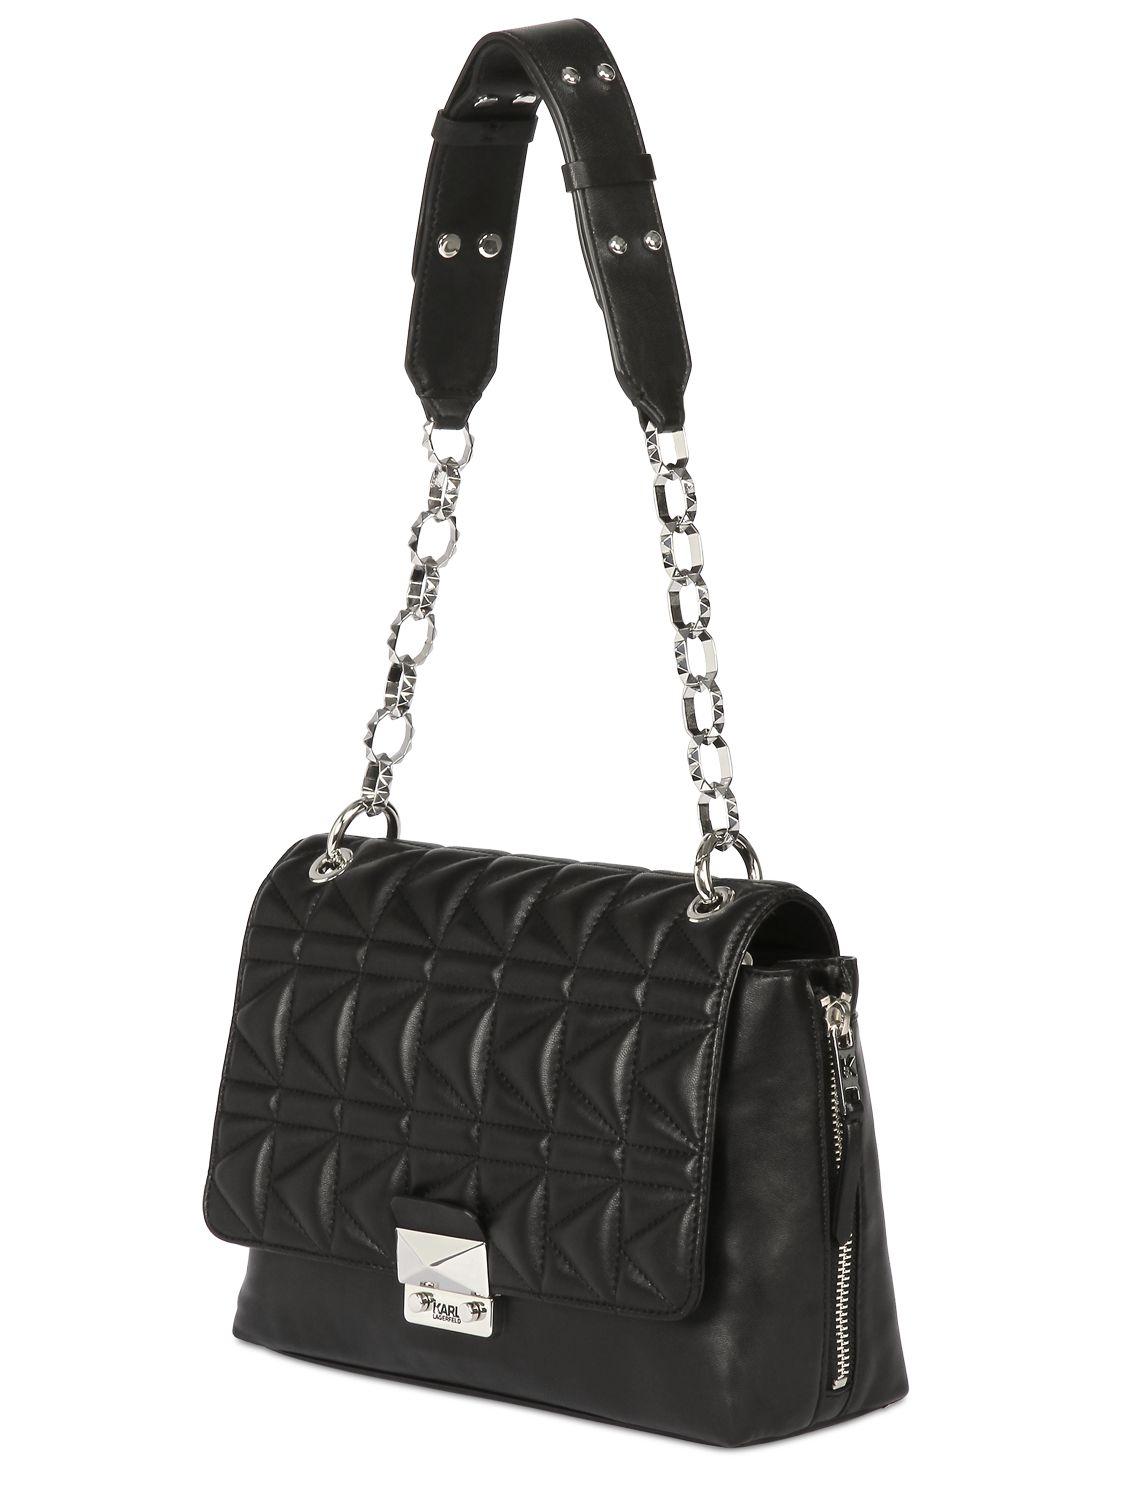 K/Kuilted Studs small shoulder bag - Black Karl Lagerfeld vSdsCSKk